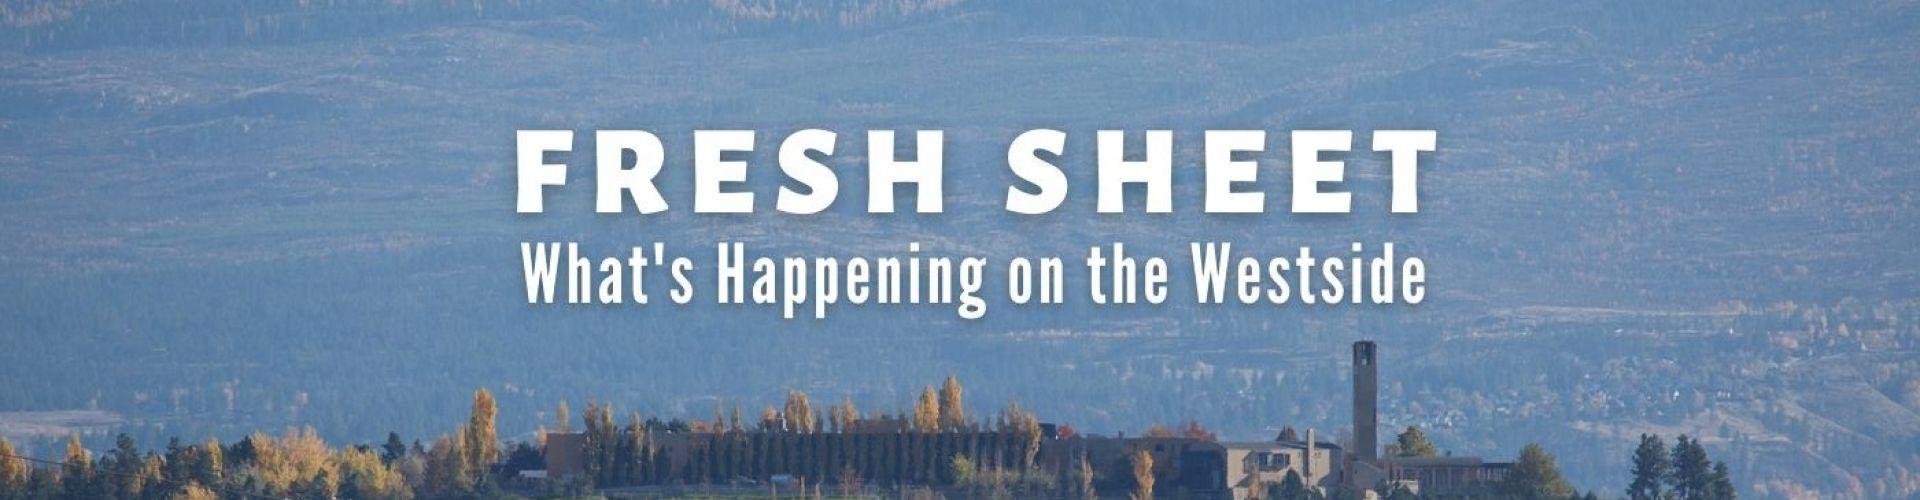 Fresh Sheet - What's Happening